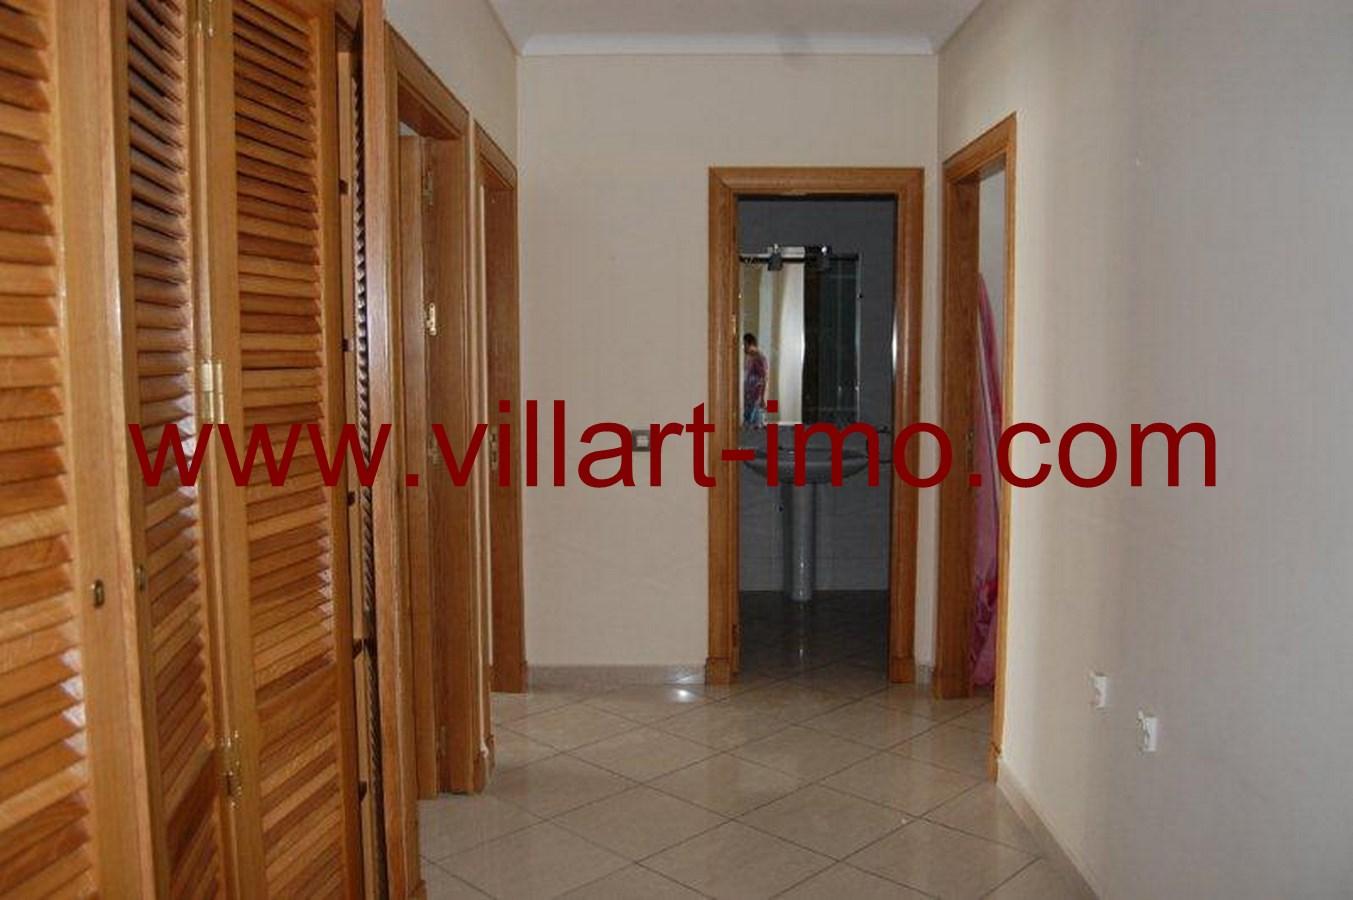 3-Location-Appartement-Non meublé-Tanger-Iberia-Couloir-L484-Villart immo